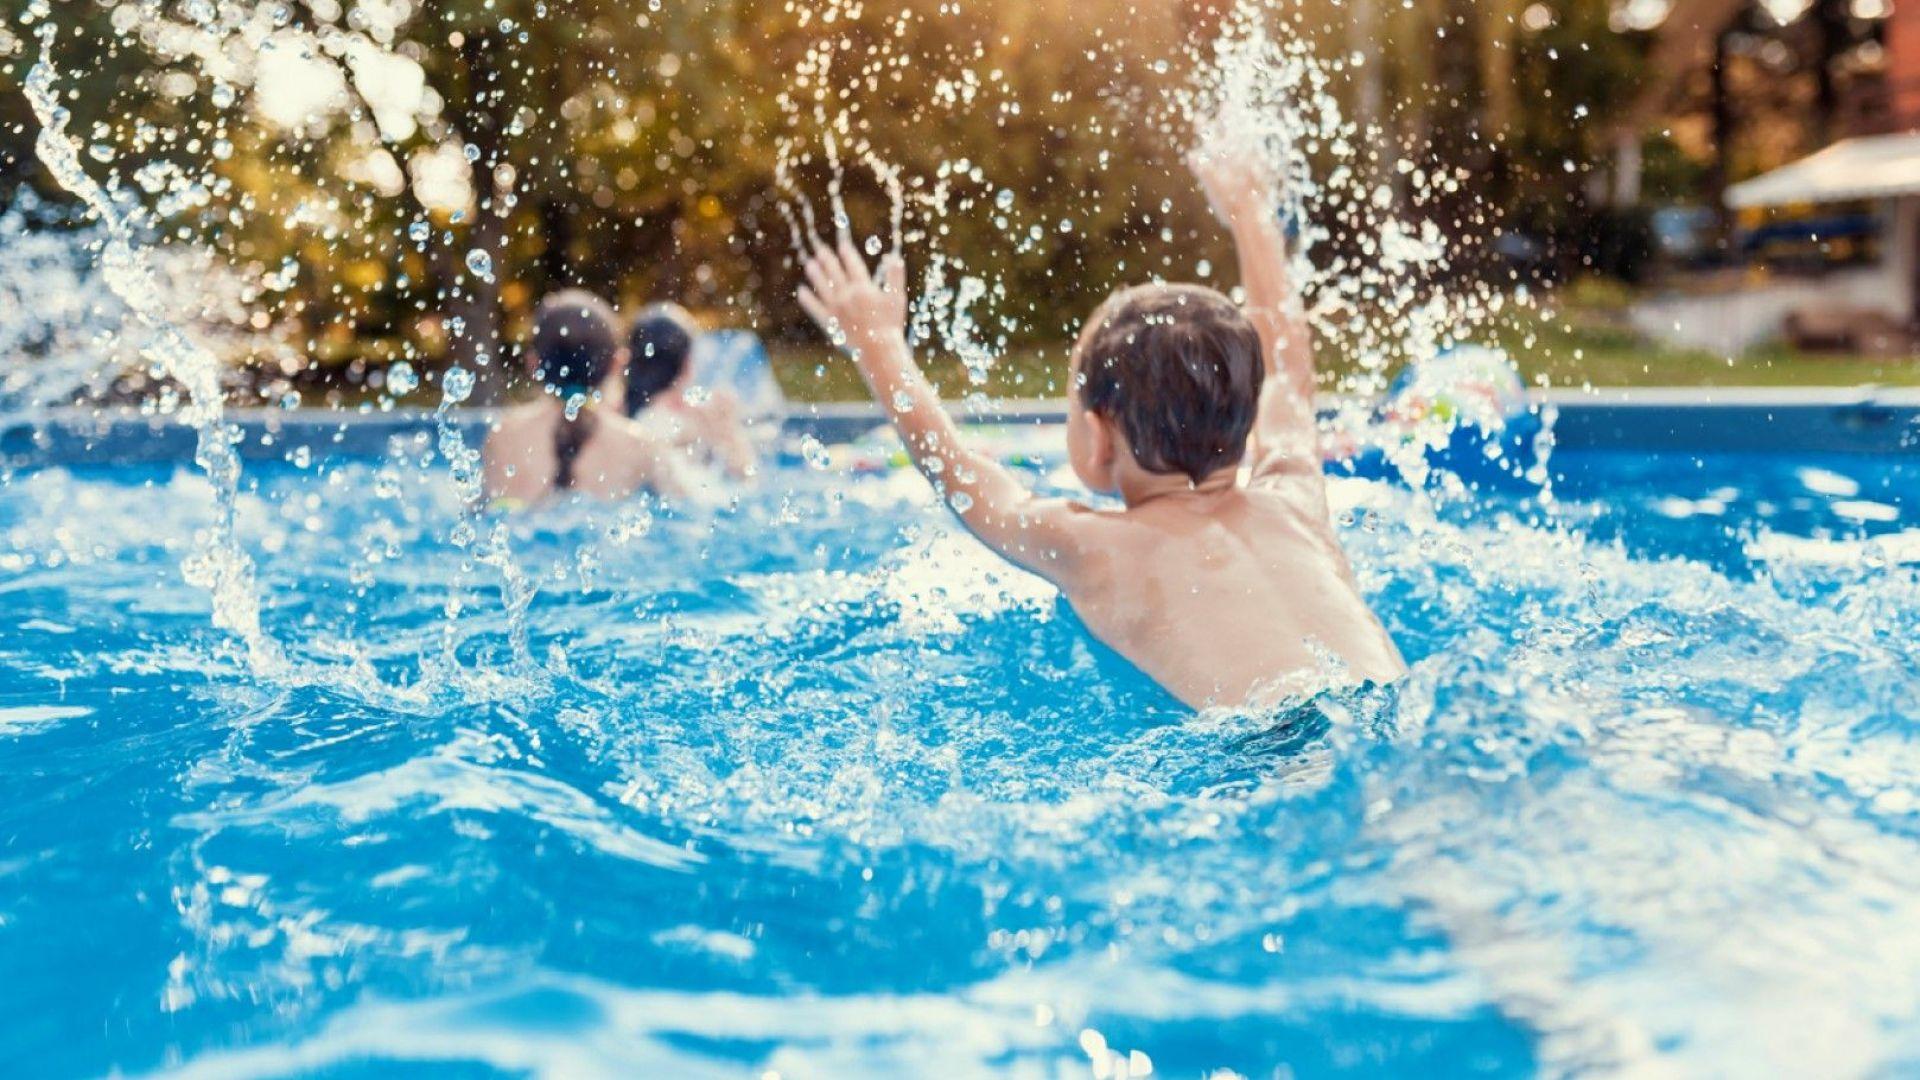 Откритите басейни в Пловдивско са изрядни, установи проверка